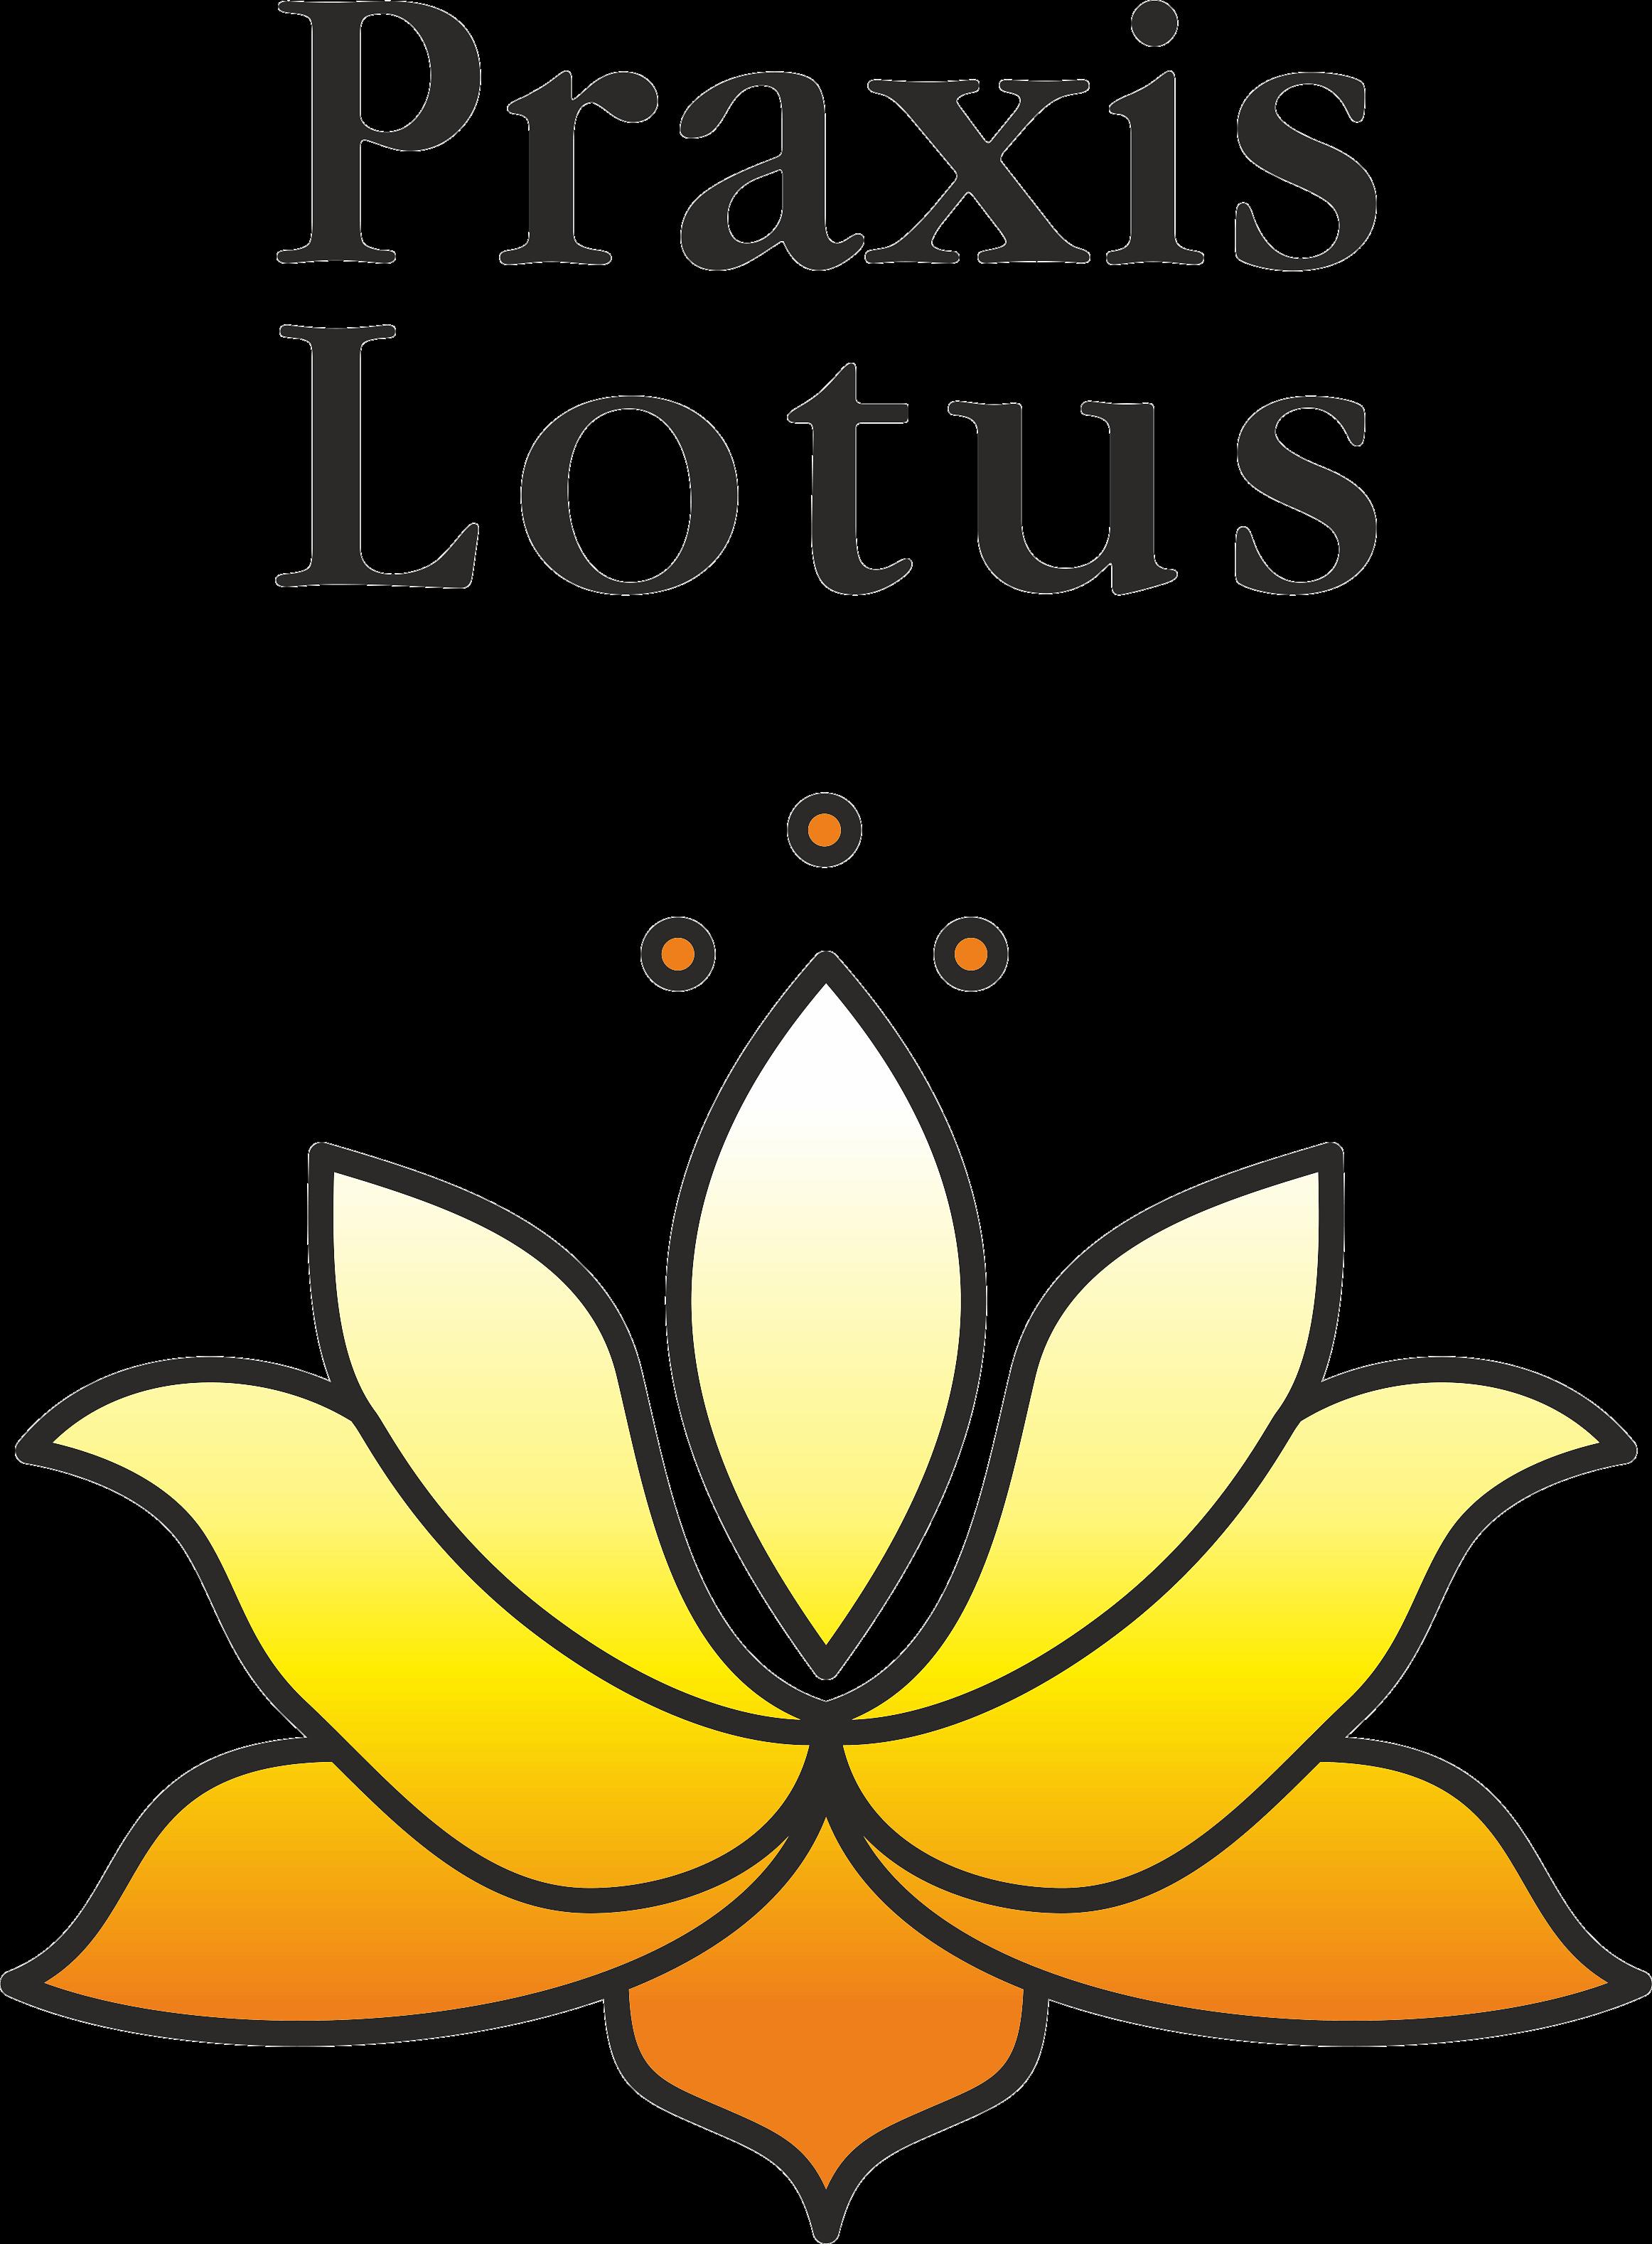 Praxis Lotus